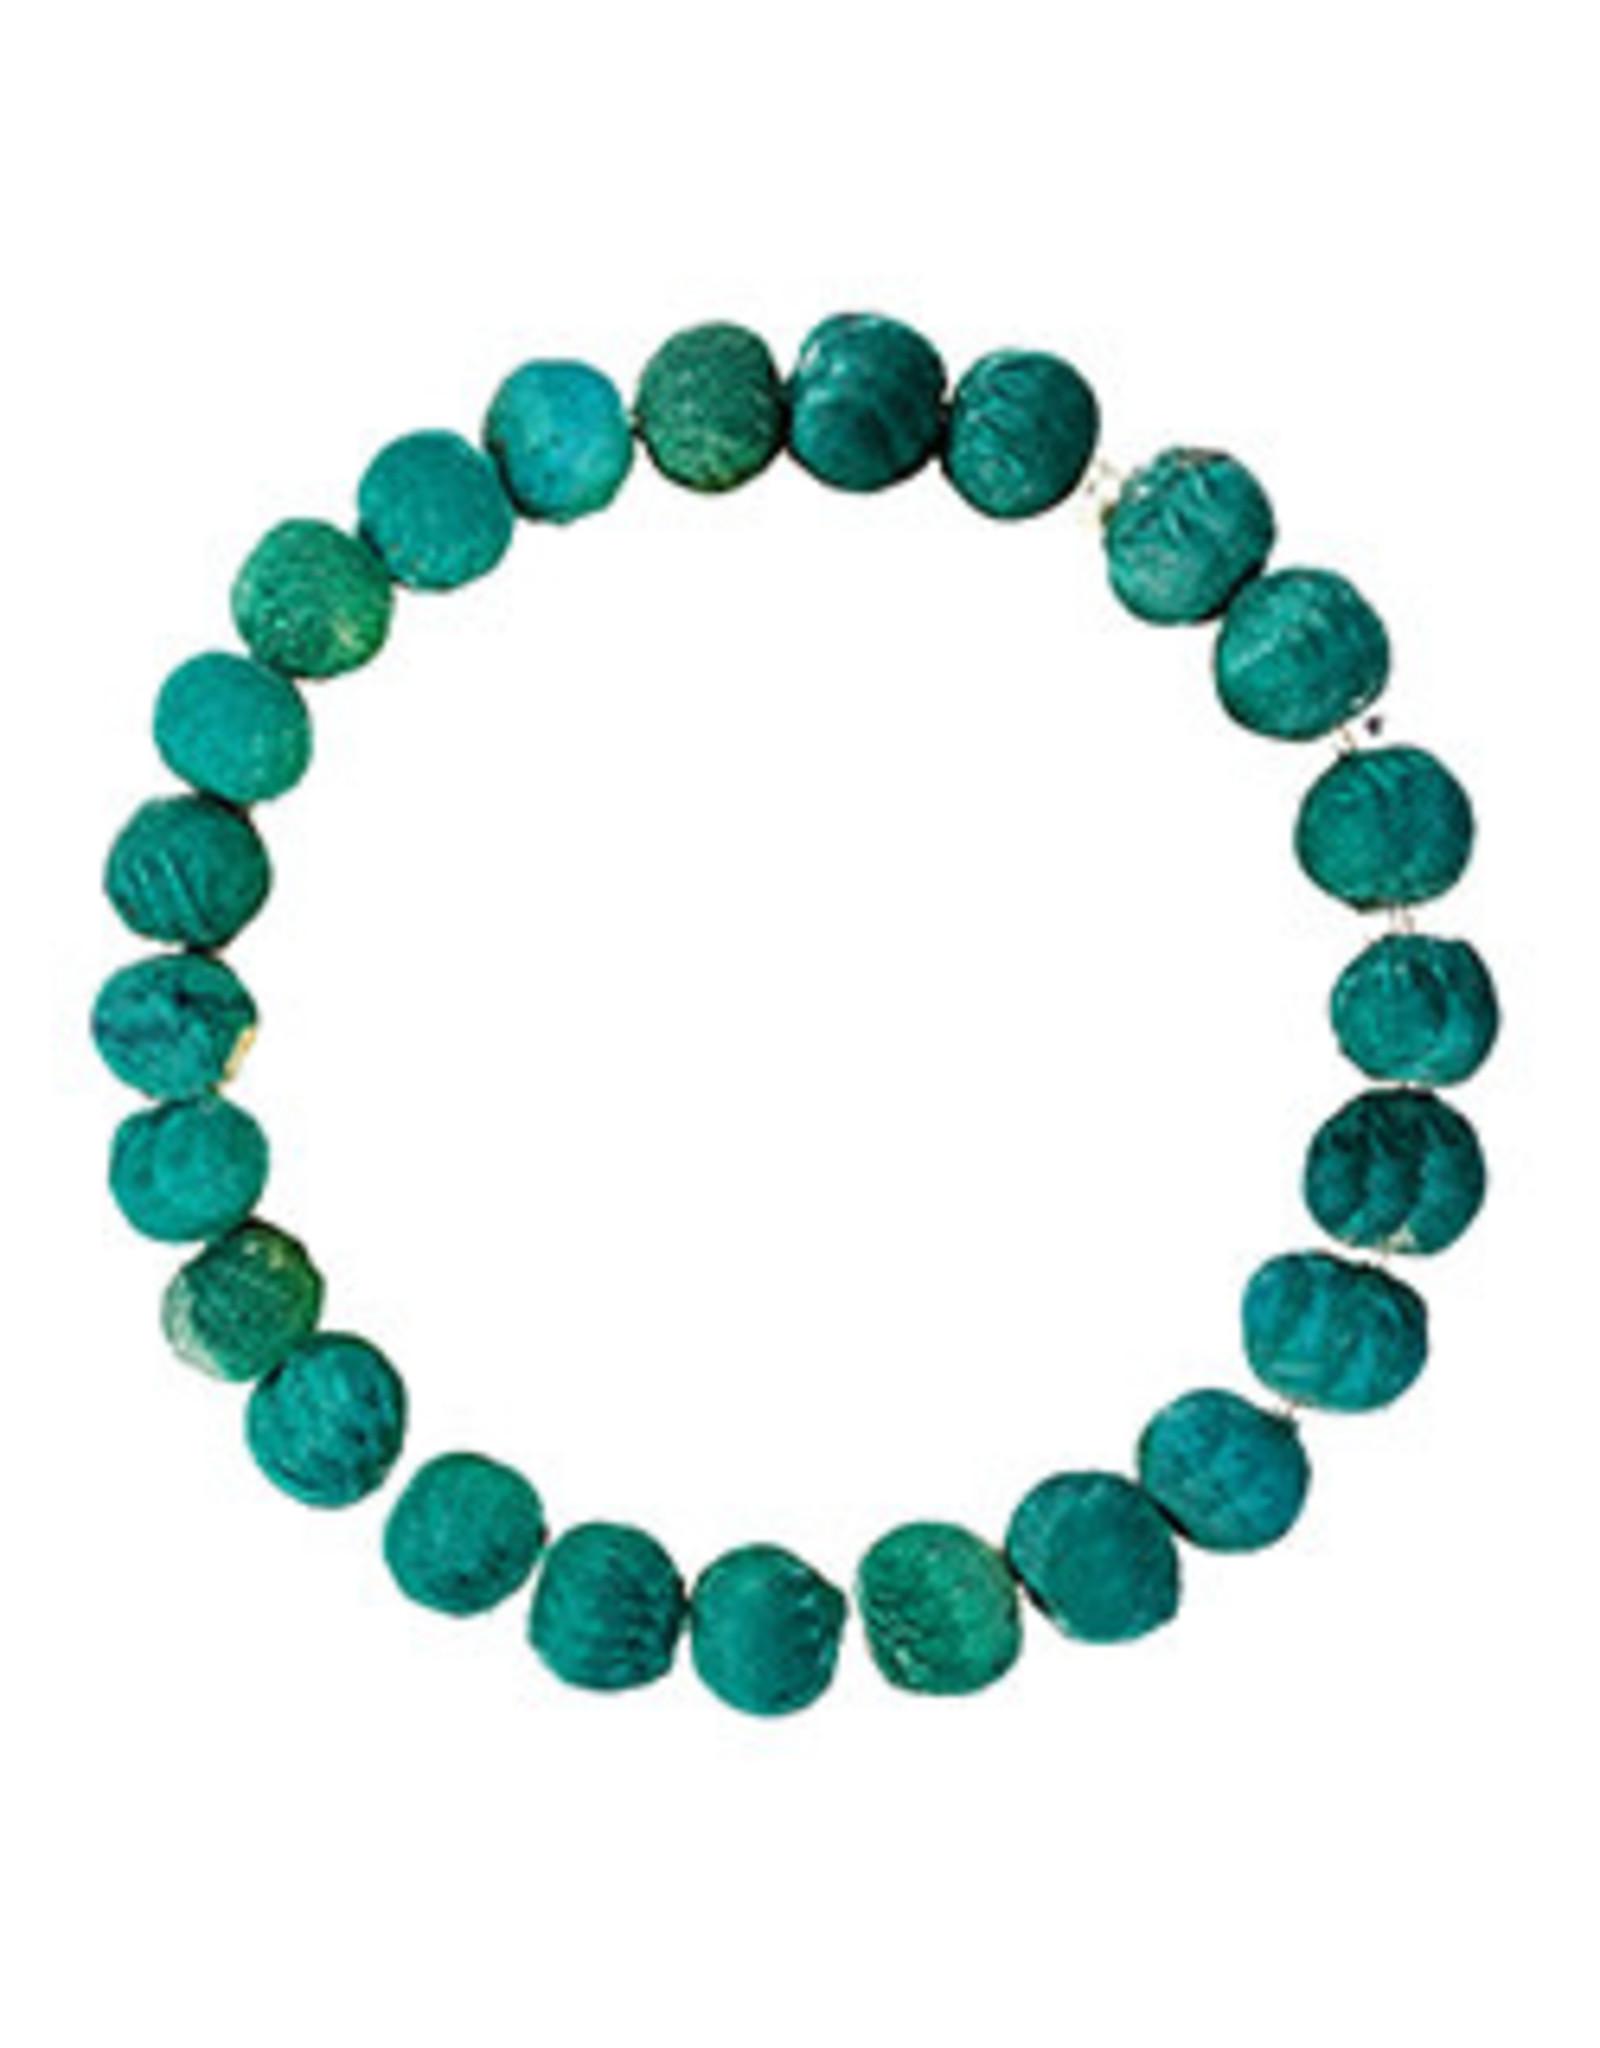 Kantha Chromatic Bracelet, Teal, India